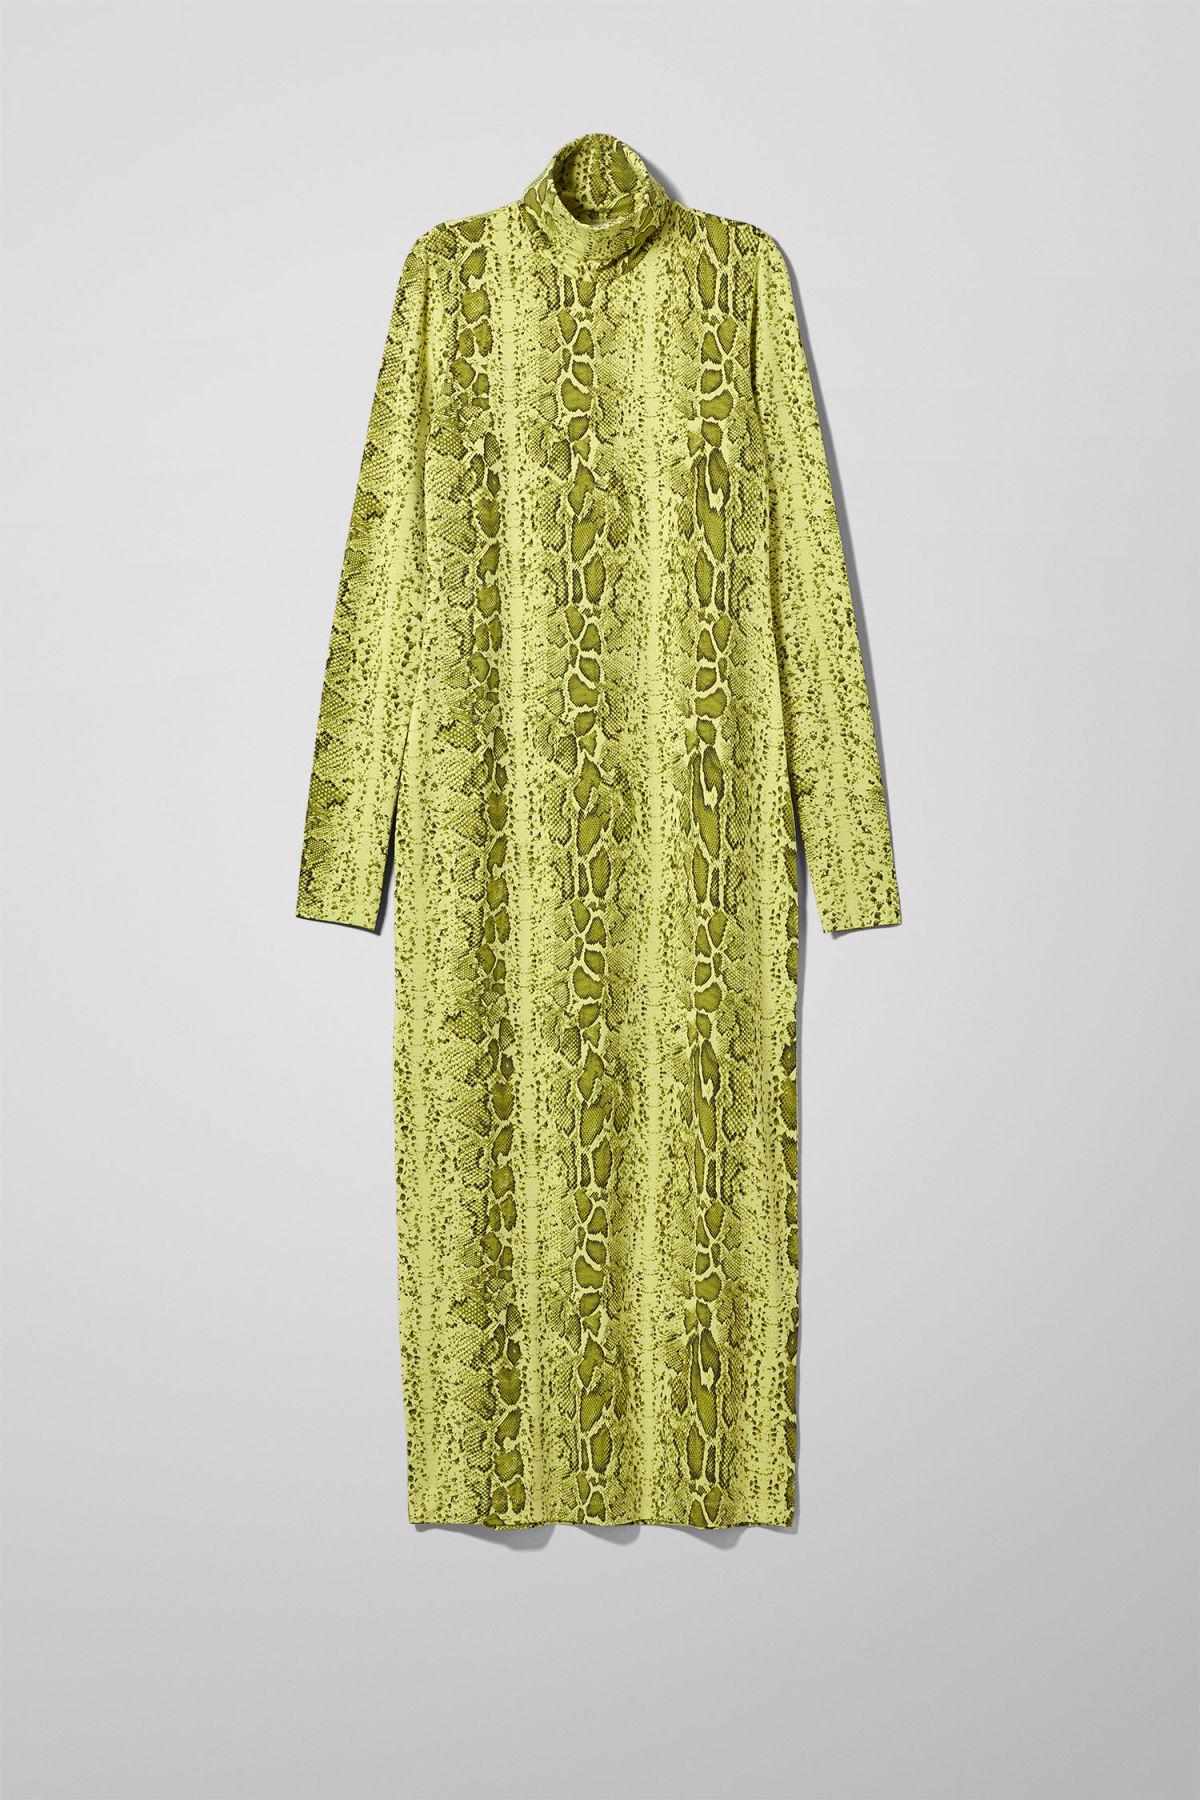 Image of Maxine Dress - Yellow-XS